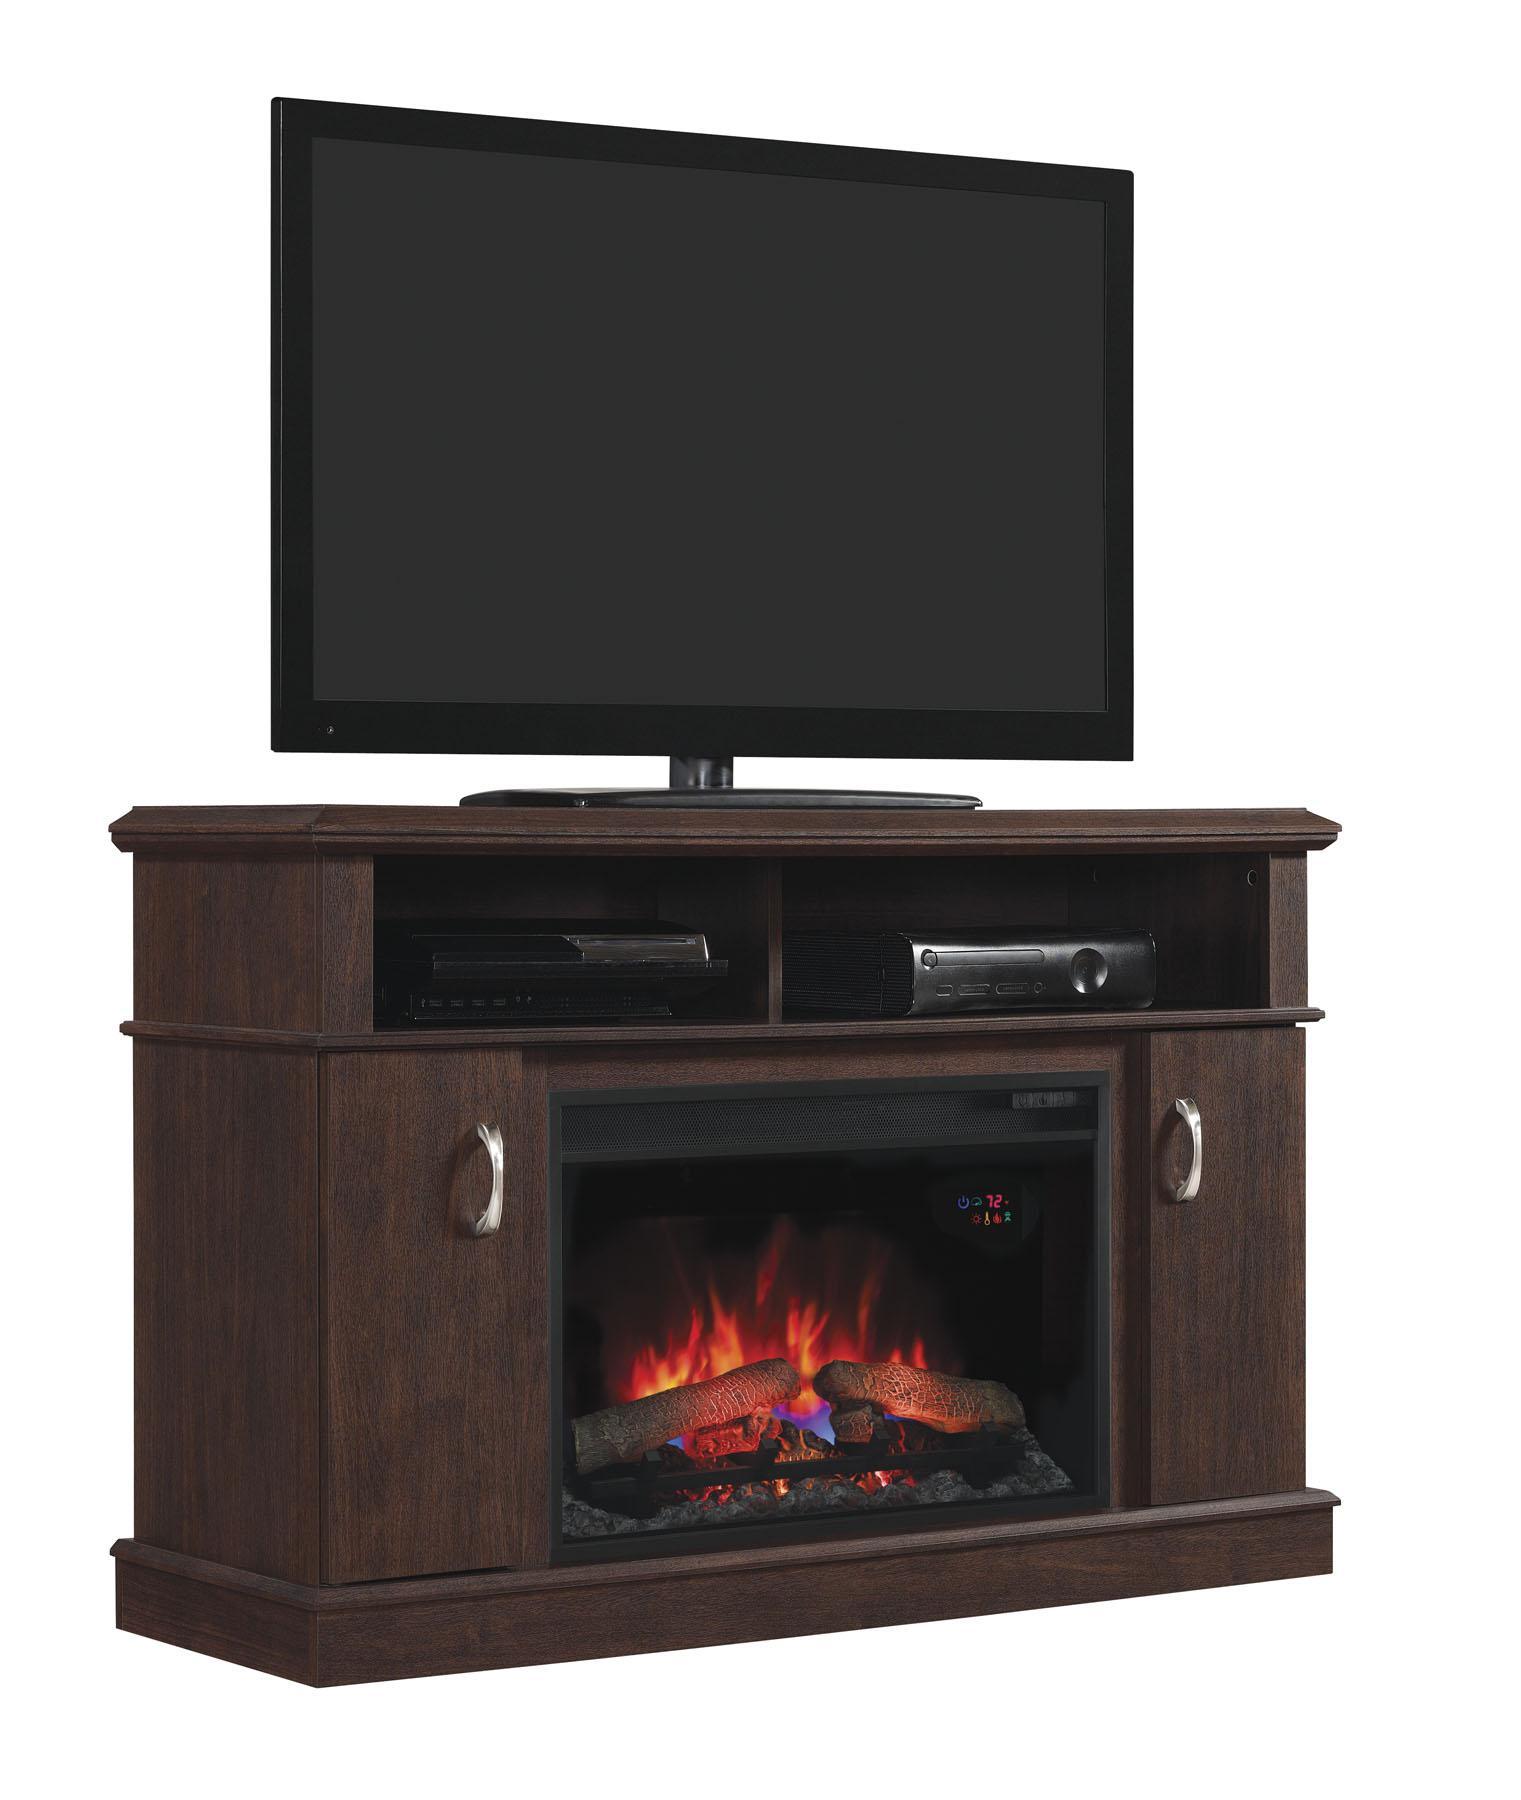 amazon com classic flame 26mm5516 pc72 dwell fireplace mantel 26